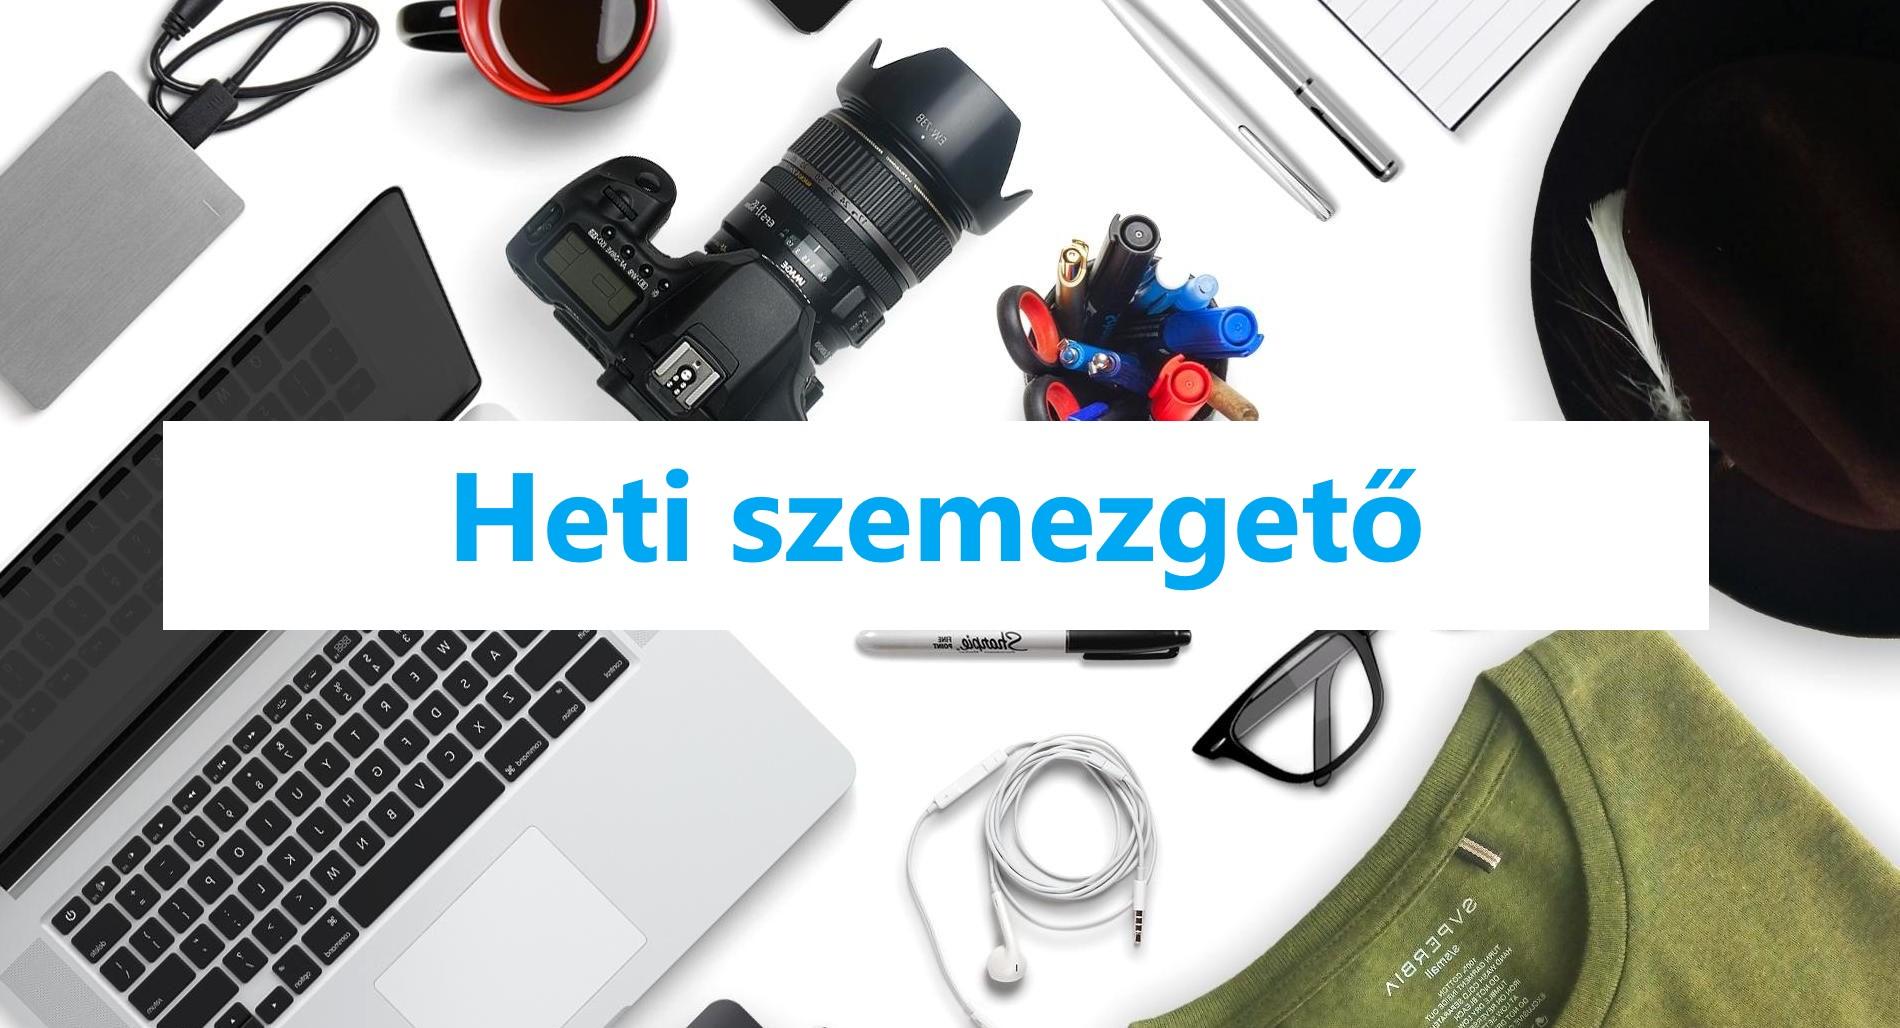 heti_szemezgeto_uj_75.jpg